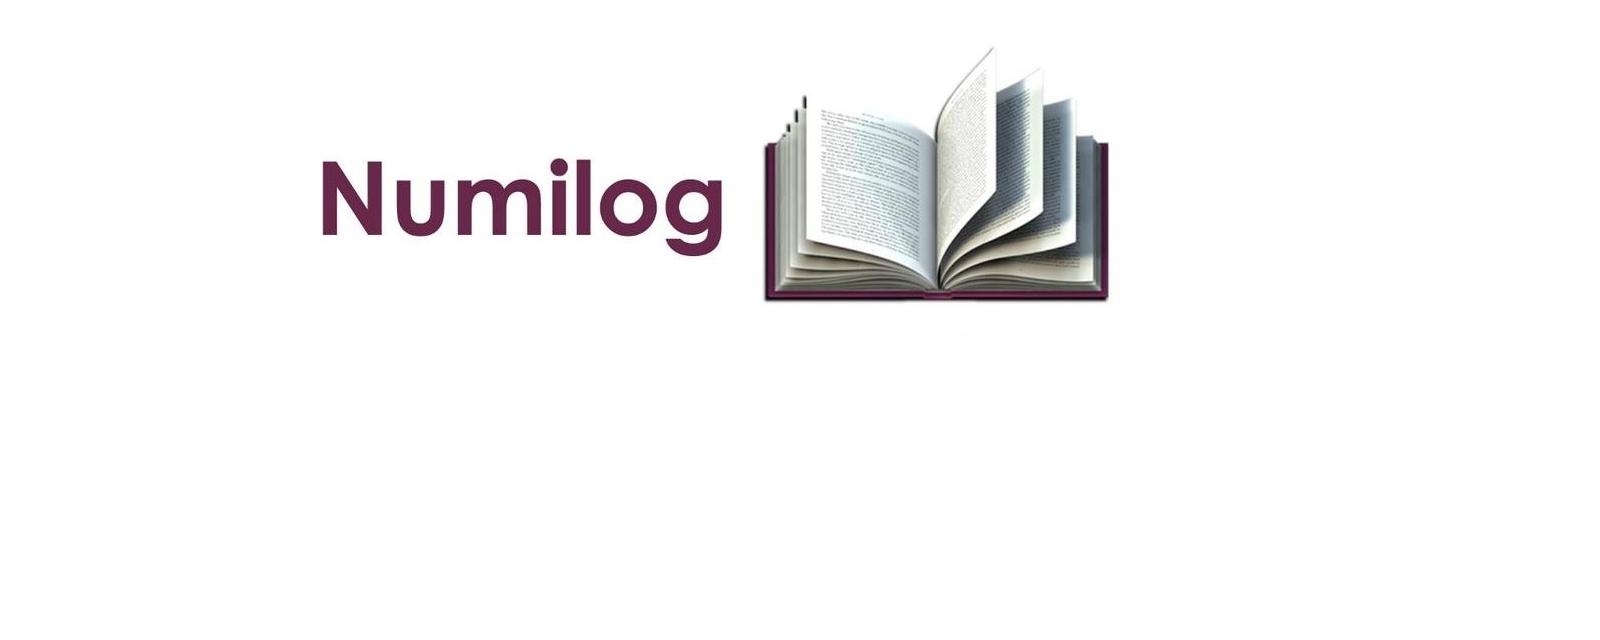 numilog-1600×640